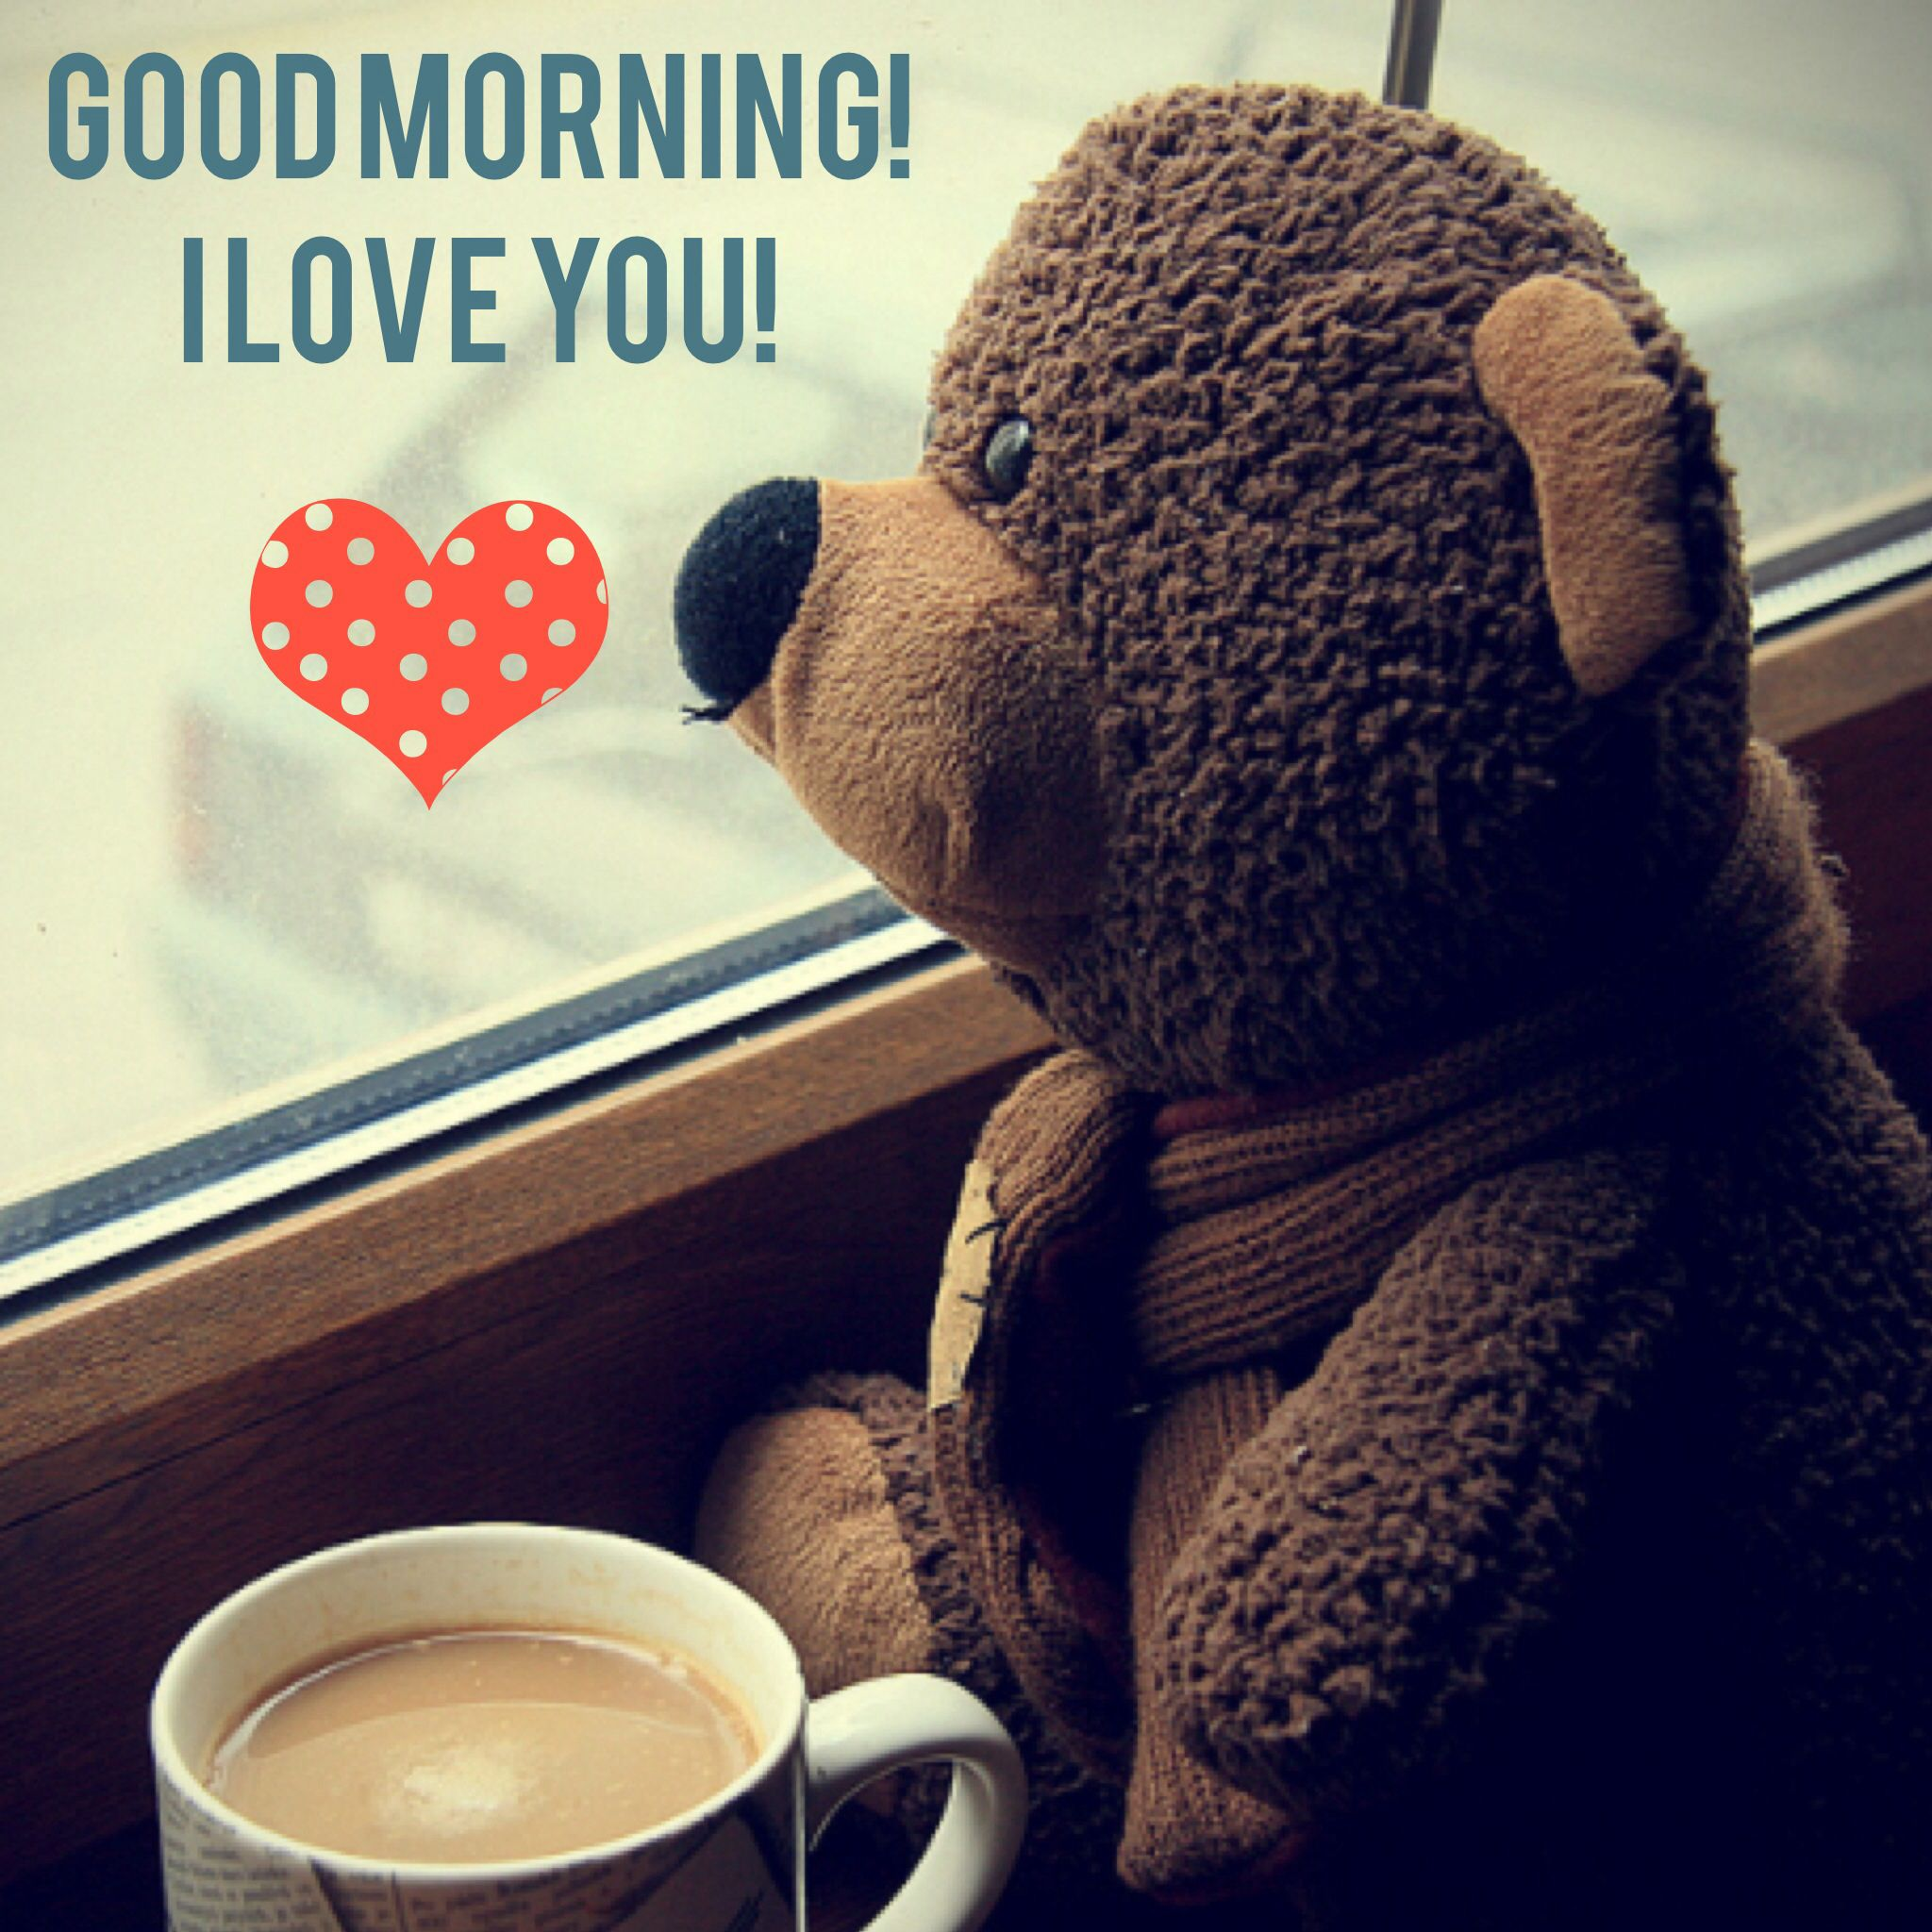 Good Morning I Love You Morning Memes Good Morning Quotes Good Morning